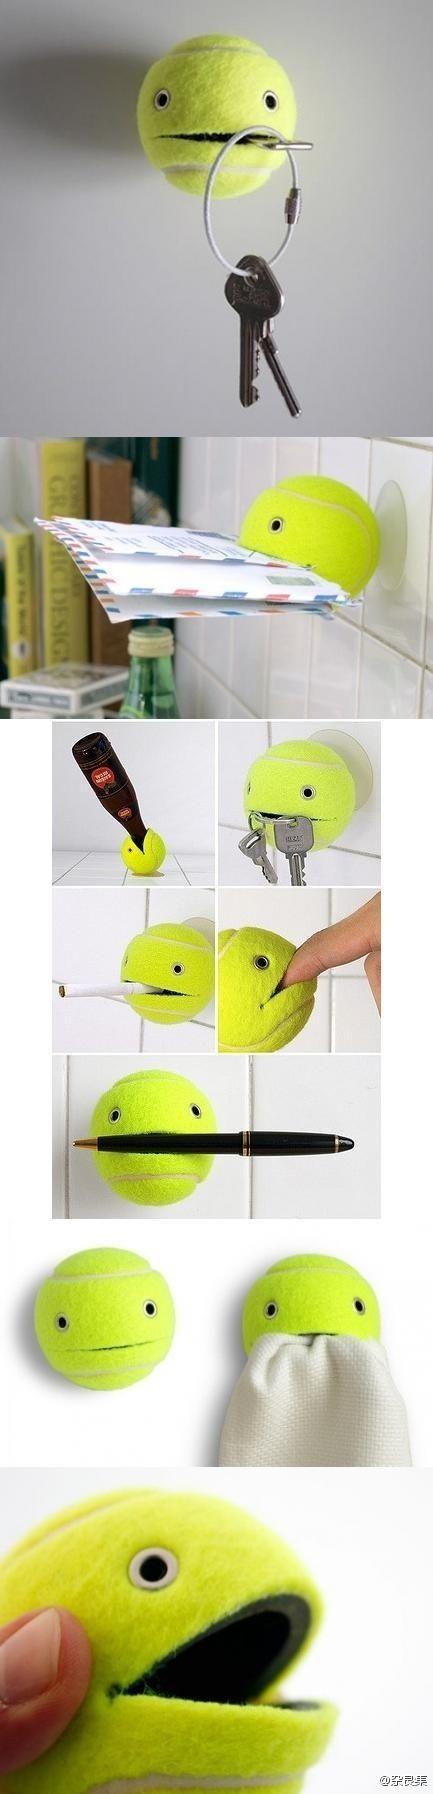 tennis ball helper | Stuff to Try | Pinterest | DIY, Crafts and Fun crafts